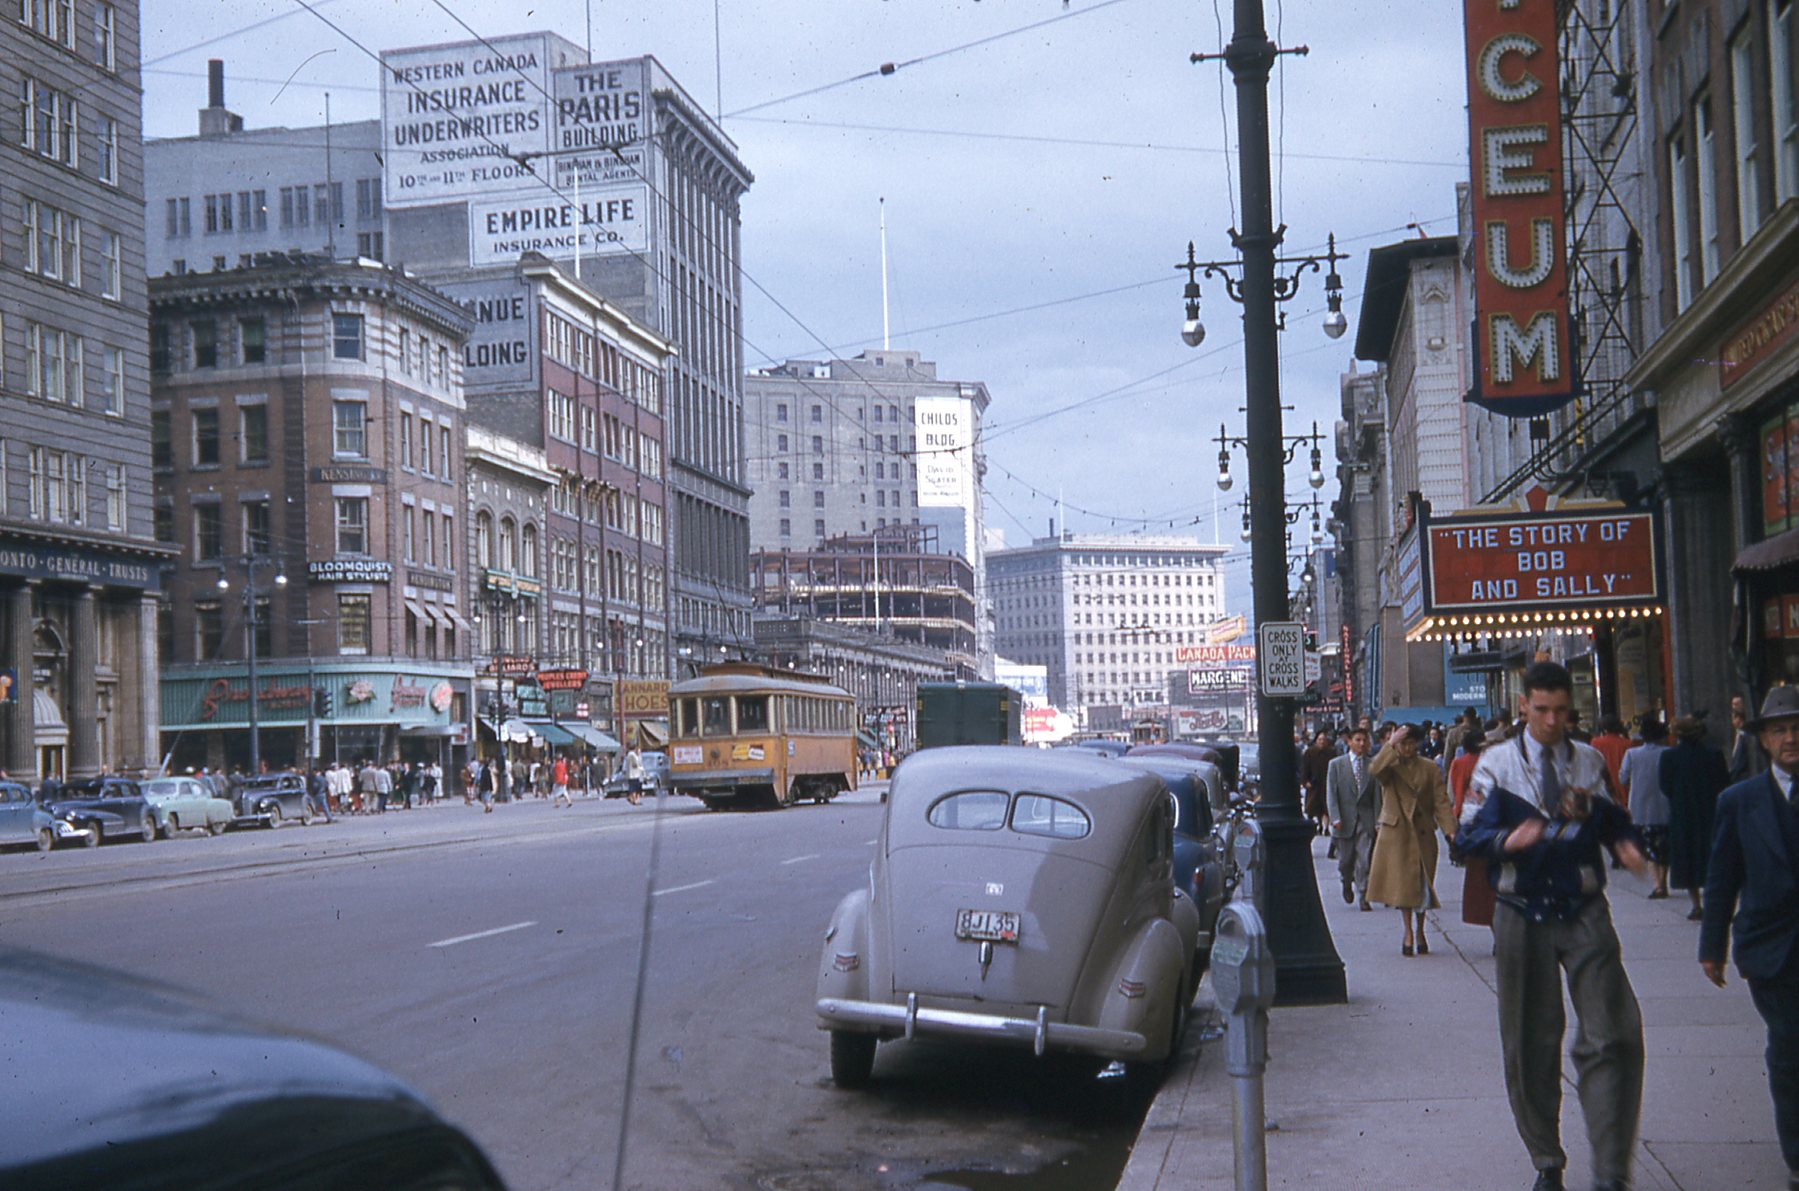 1948 winnipeg